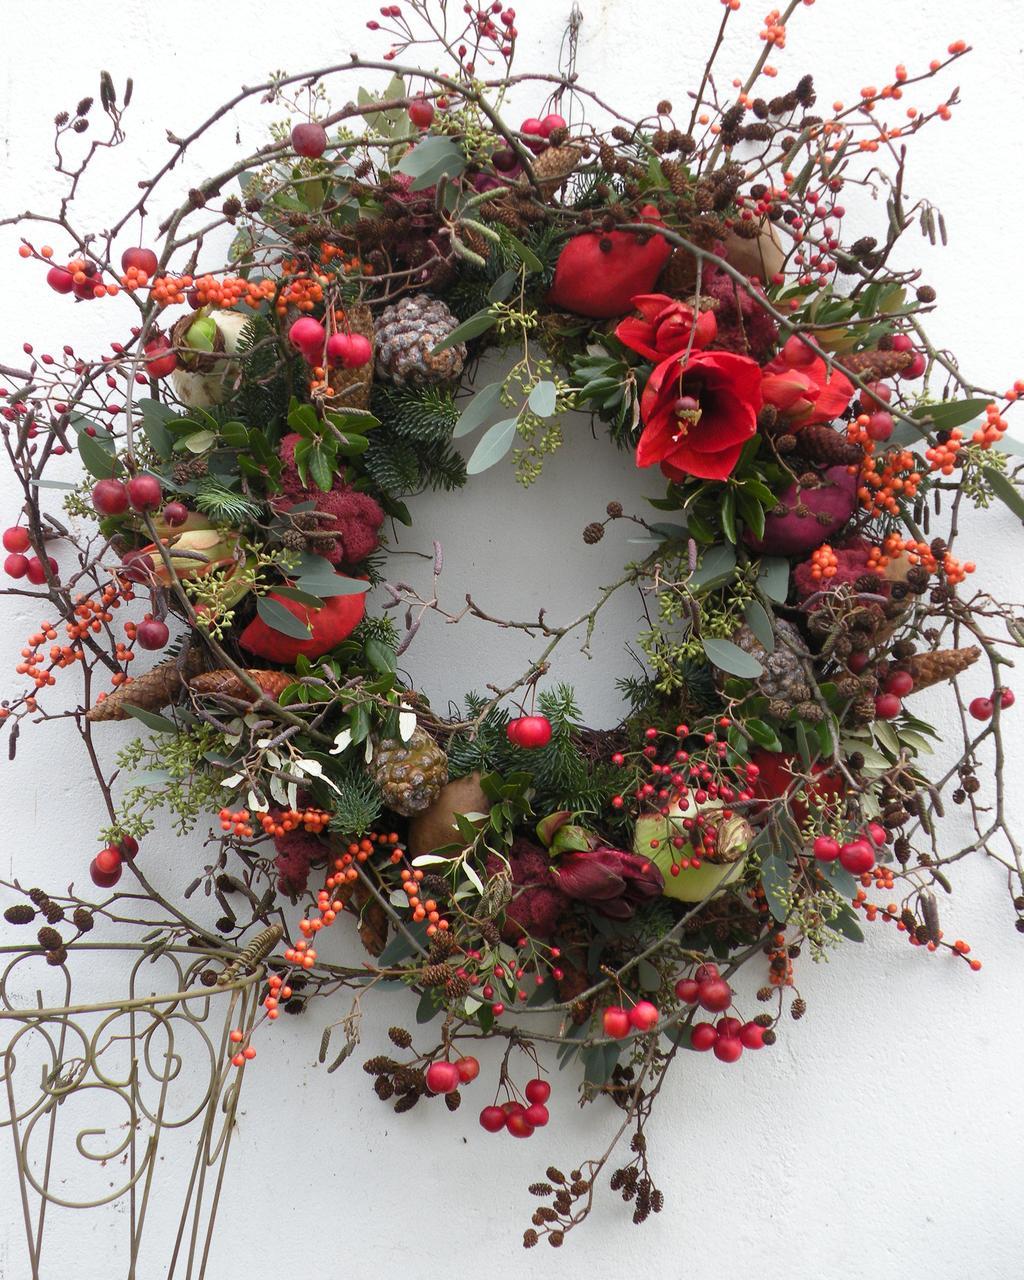 Kerstmoois van eigen pluk - Blogger Kristel - vtwonen